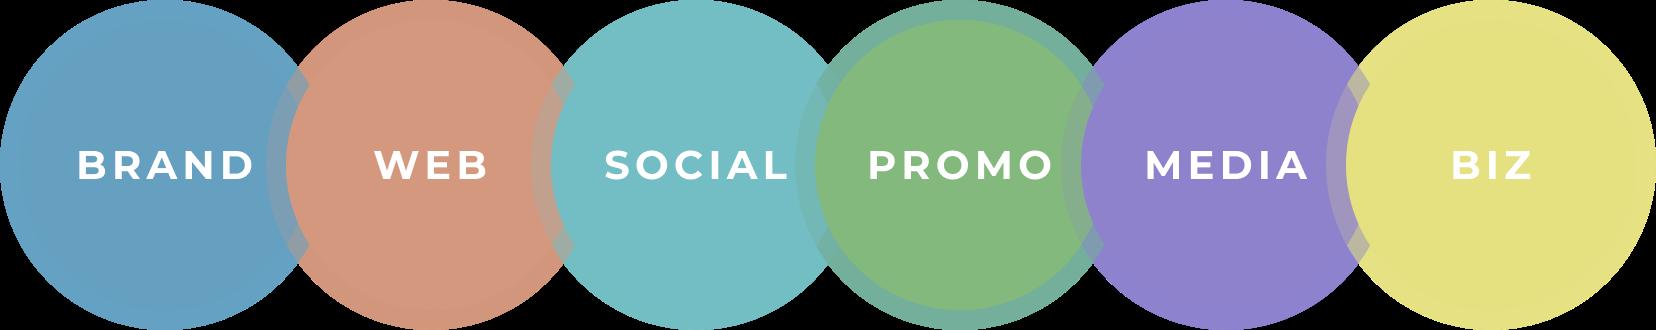 6 pillars of marketing: brand, web, social, promo, media, and biz